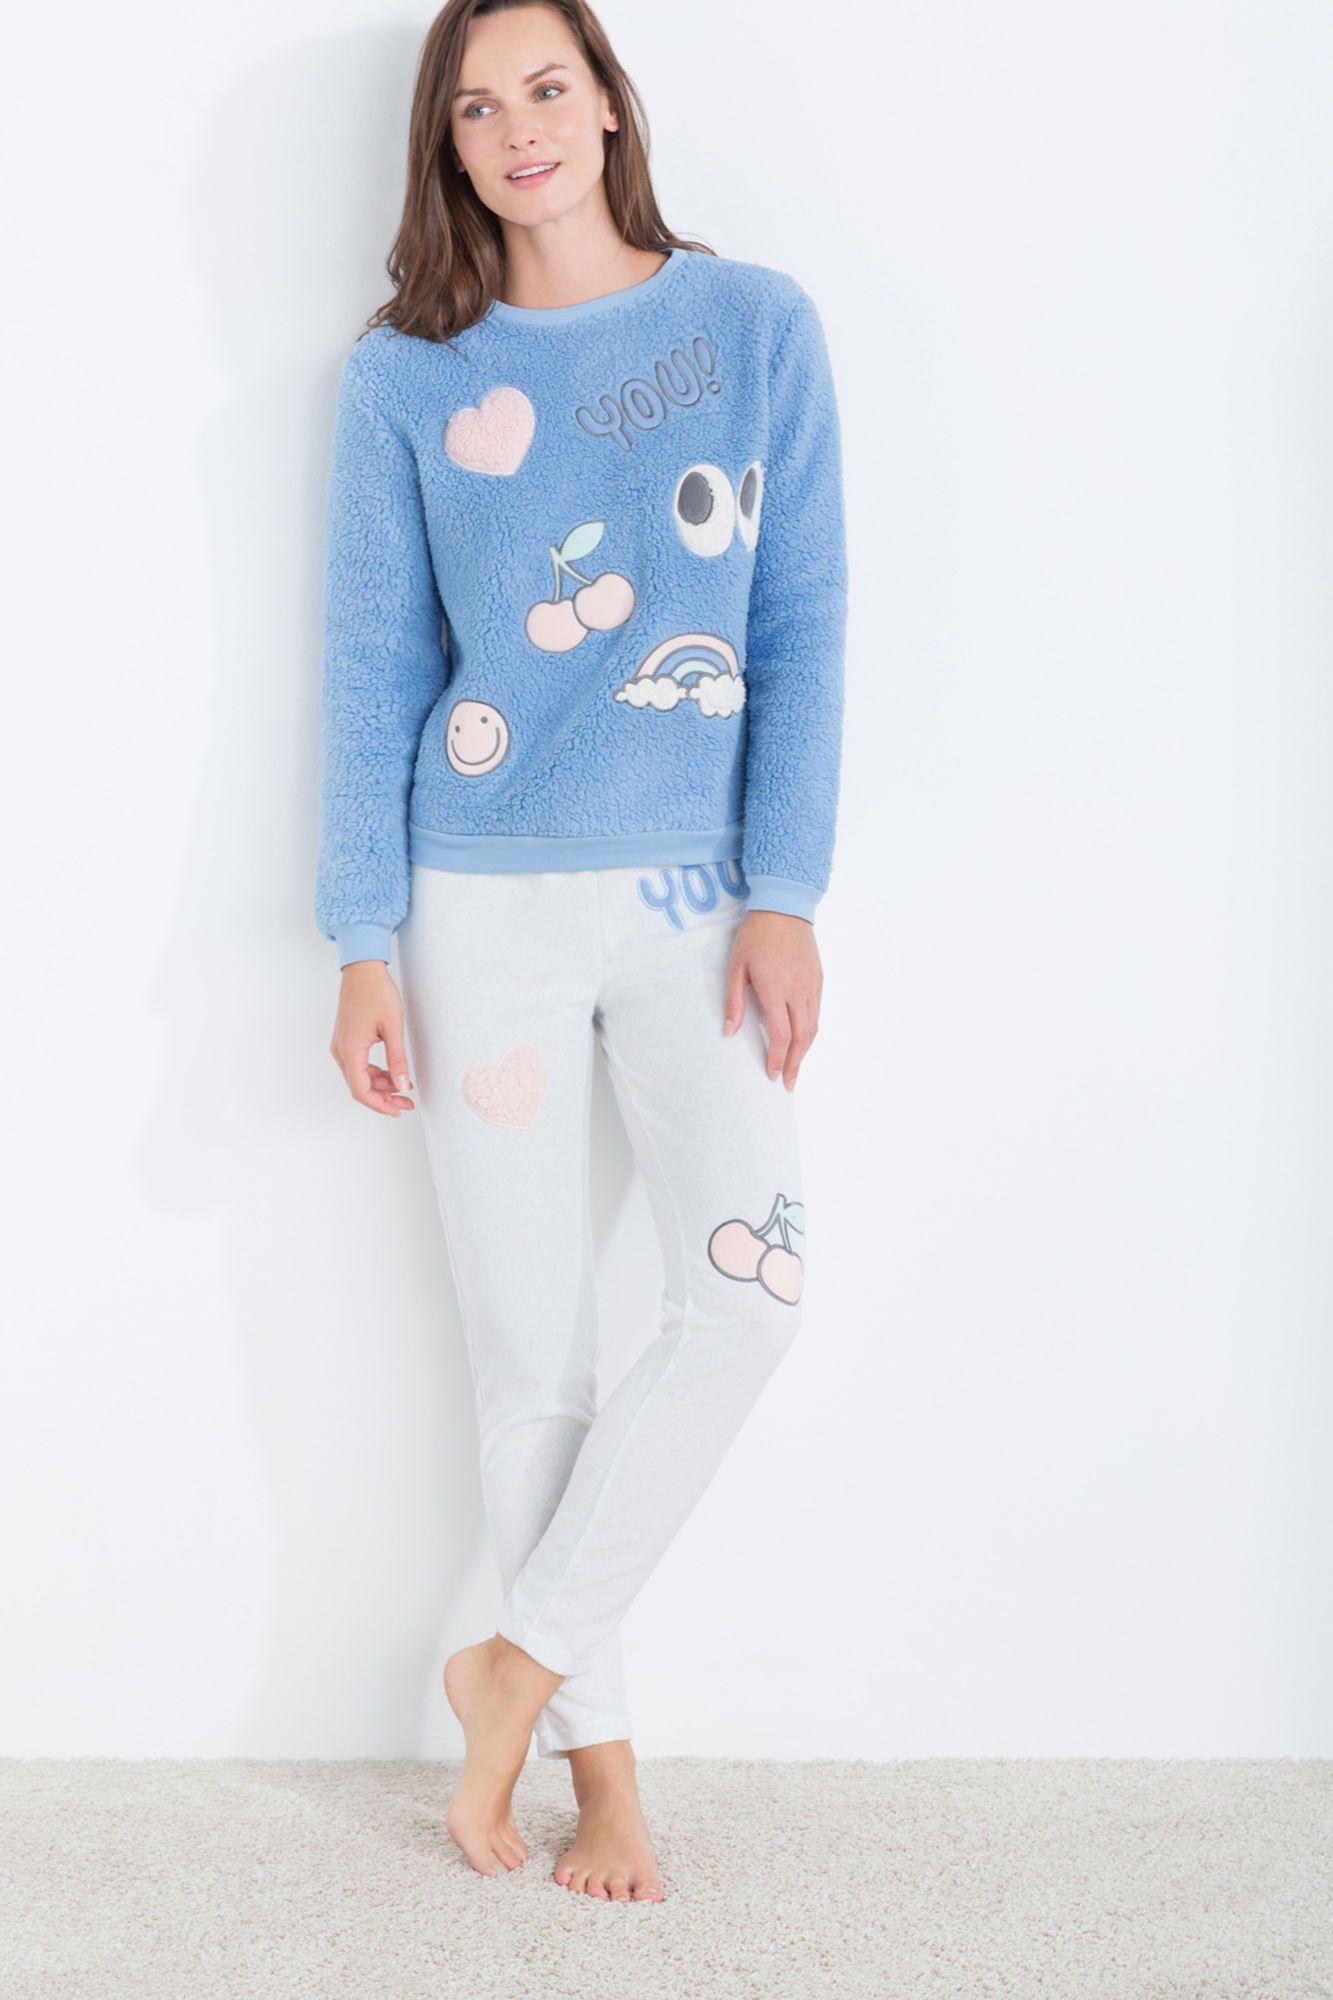 6fb56a816 Pijama largo polar  You!  in 2019